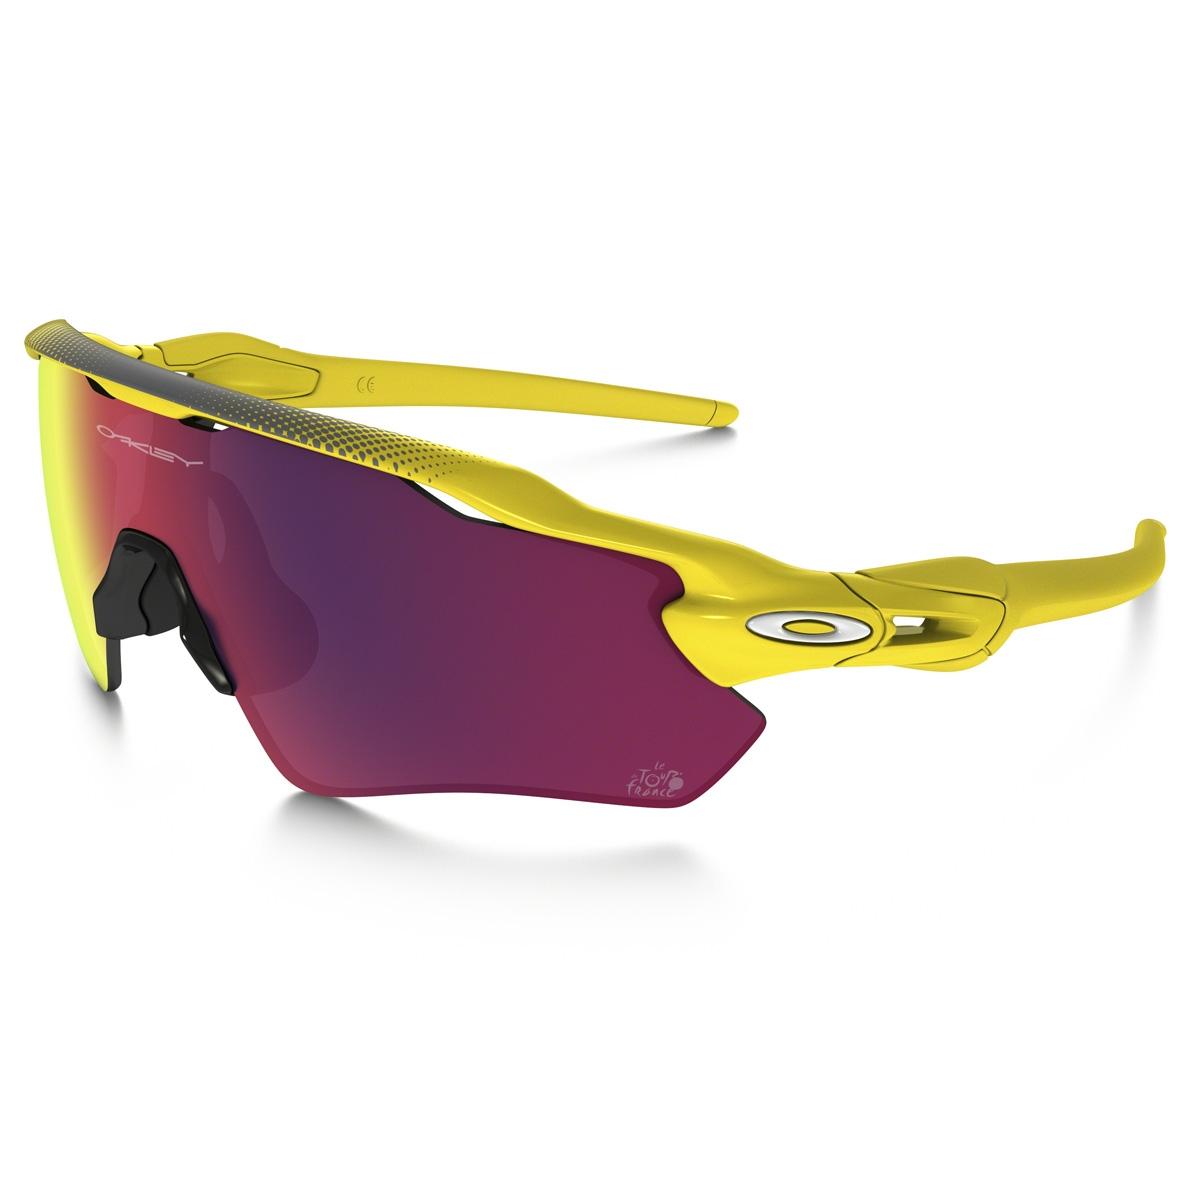 44ed213d84 Image of Oakley Radar EV Path Prizm Road Tour De France Sunglasses - Team  Yellow Frame